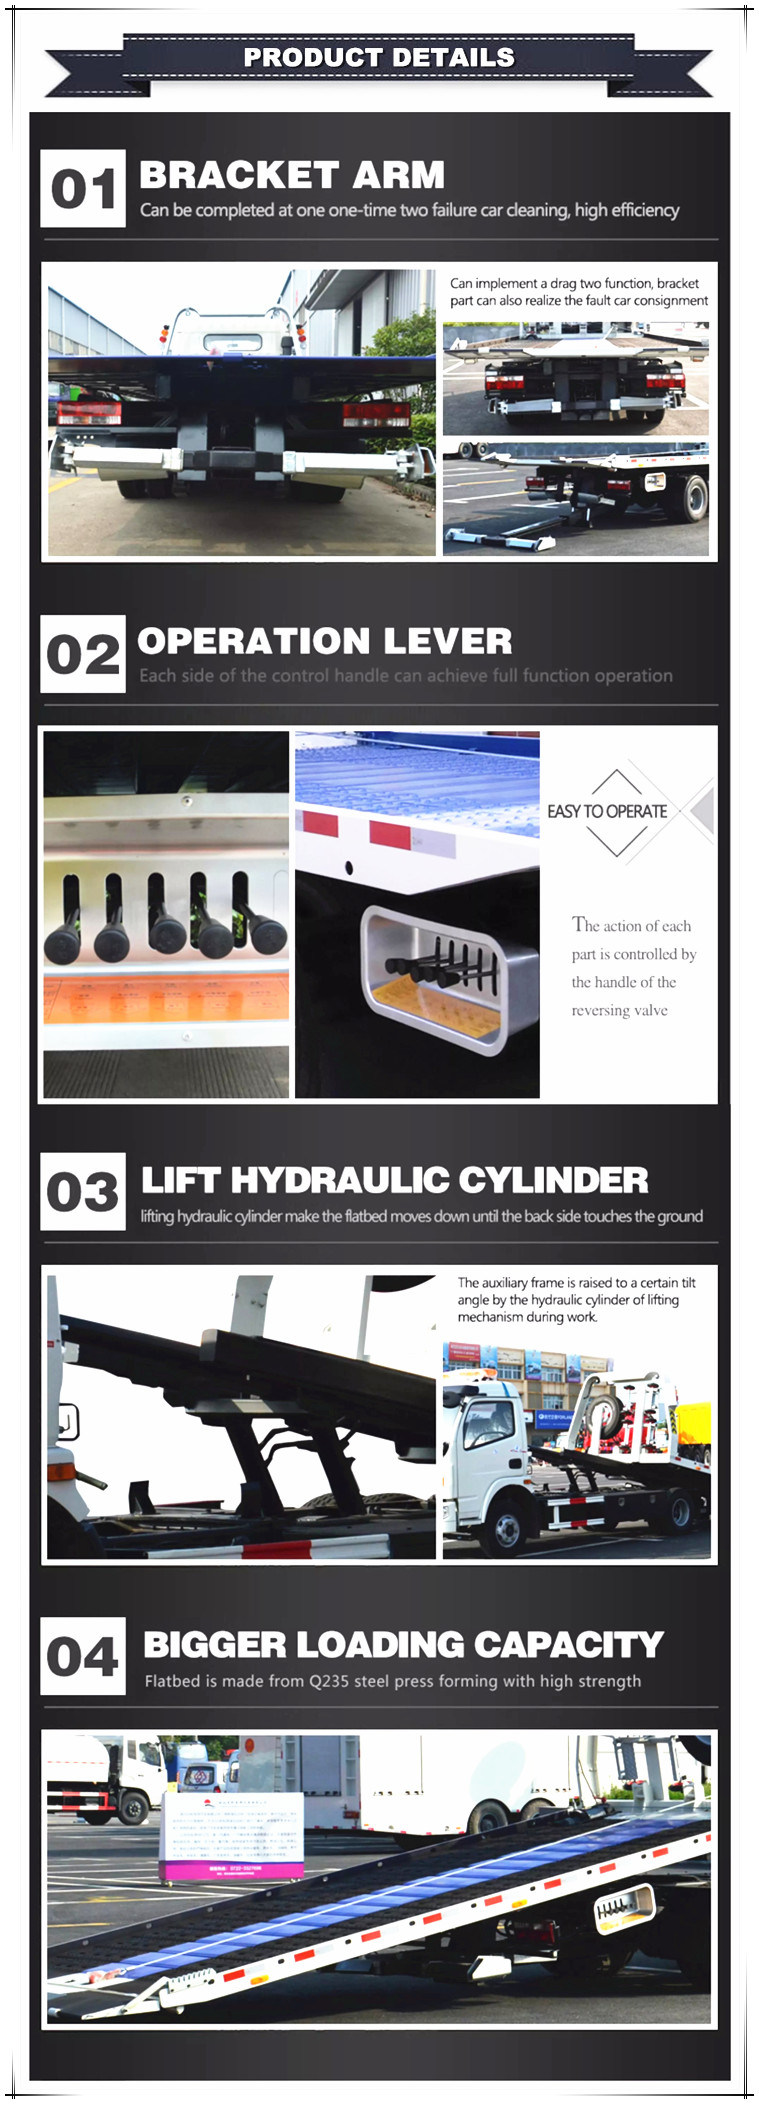 Jmc Brand 4X2 Hydraulic Winch 4 Ton Towing Car Flat Bed Wrecker Truck with Wheel Lift (half landing or full landing)